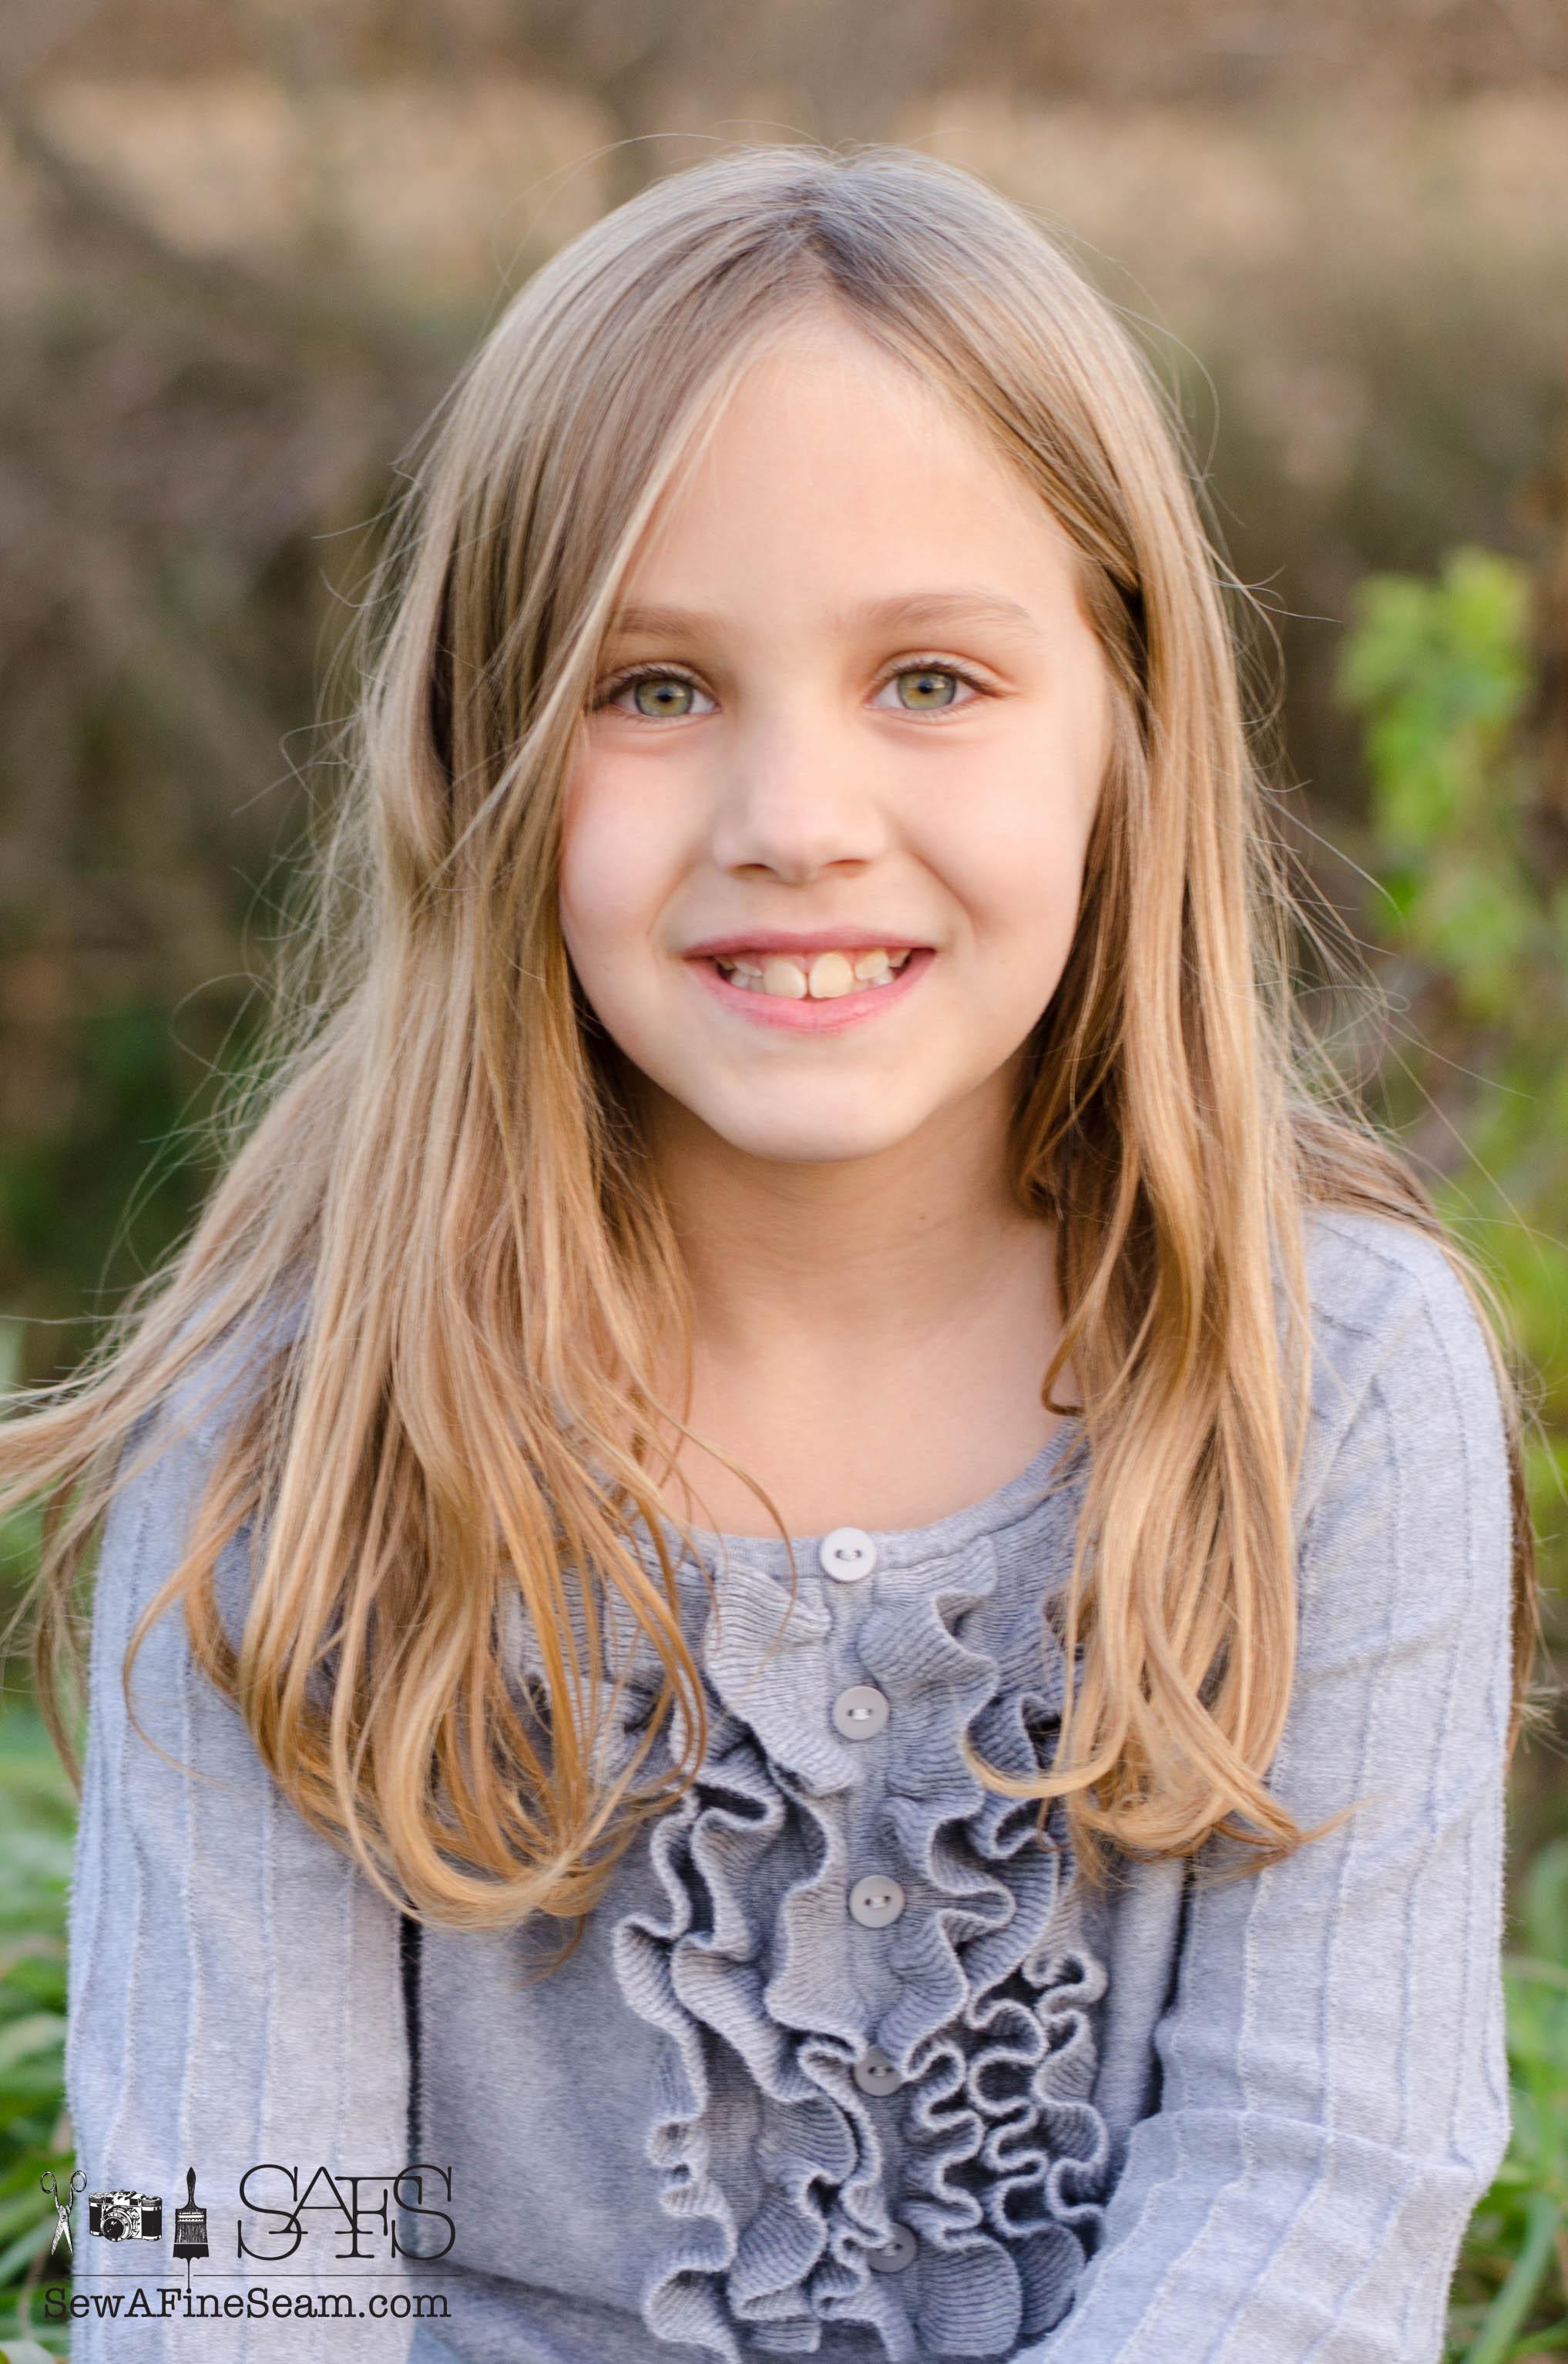 9 Years Old Girl Коллекция иллюстраций